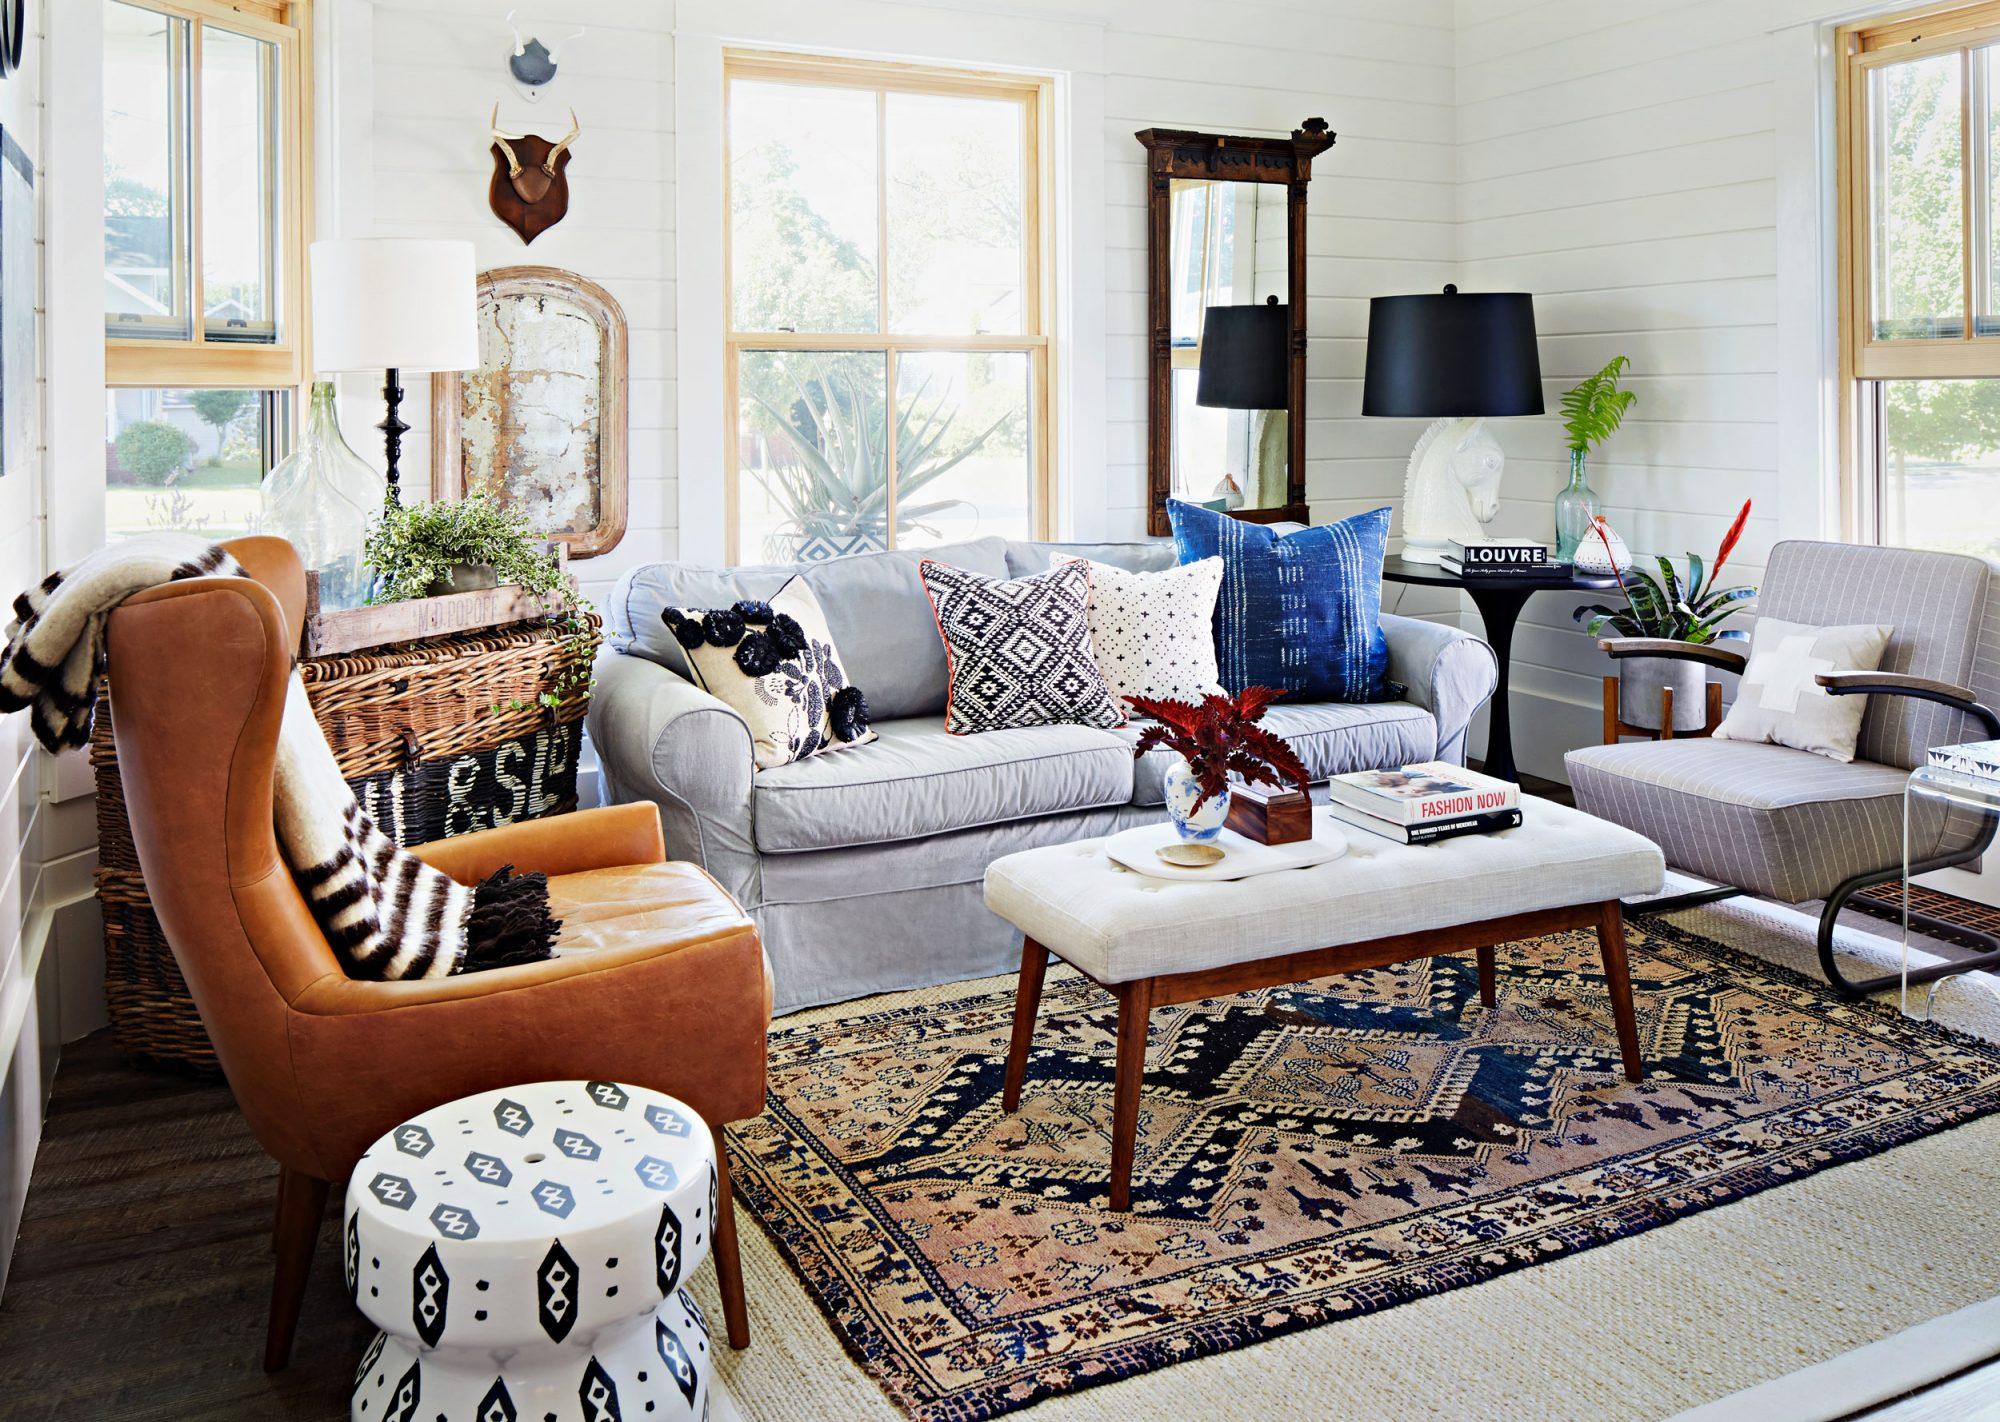 Boyles home living room